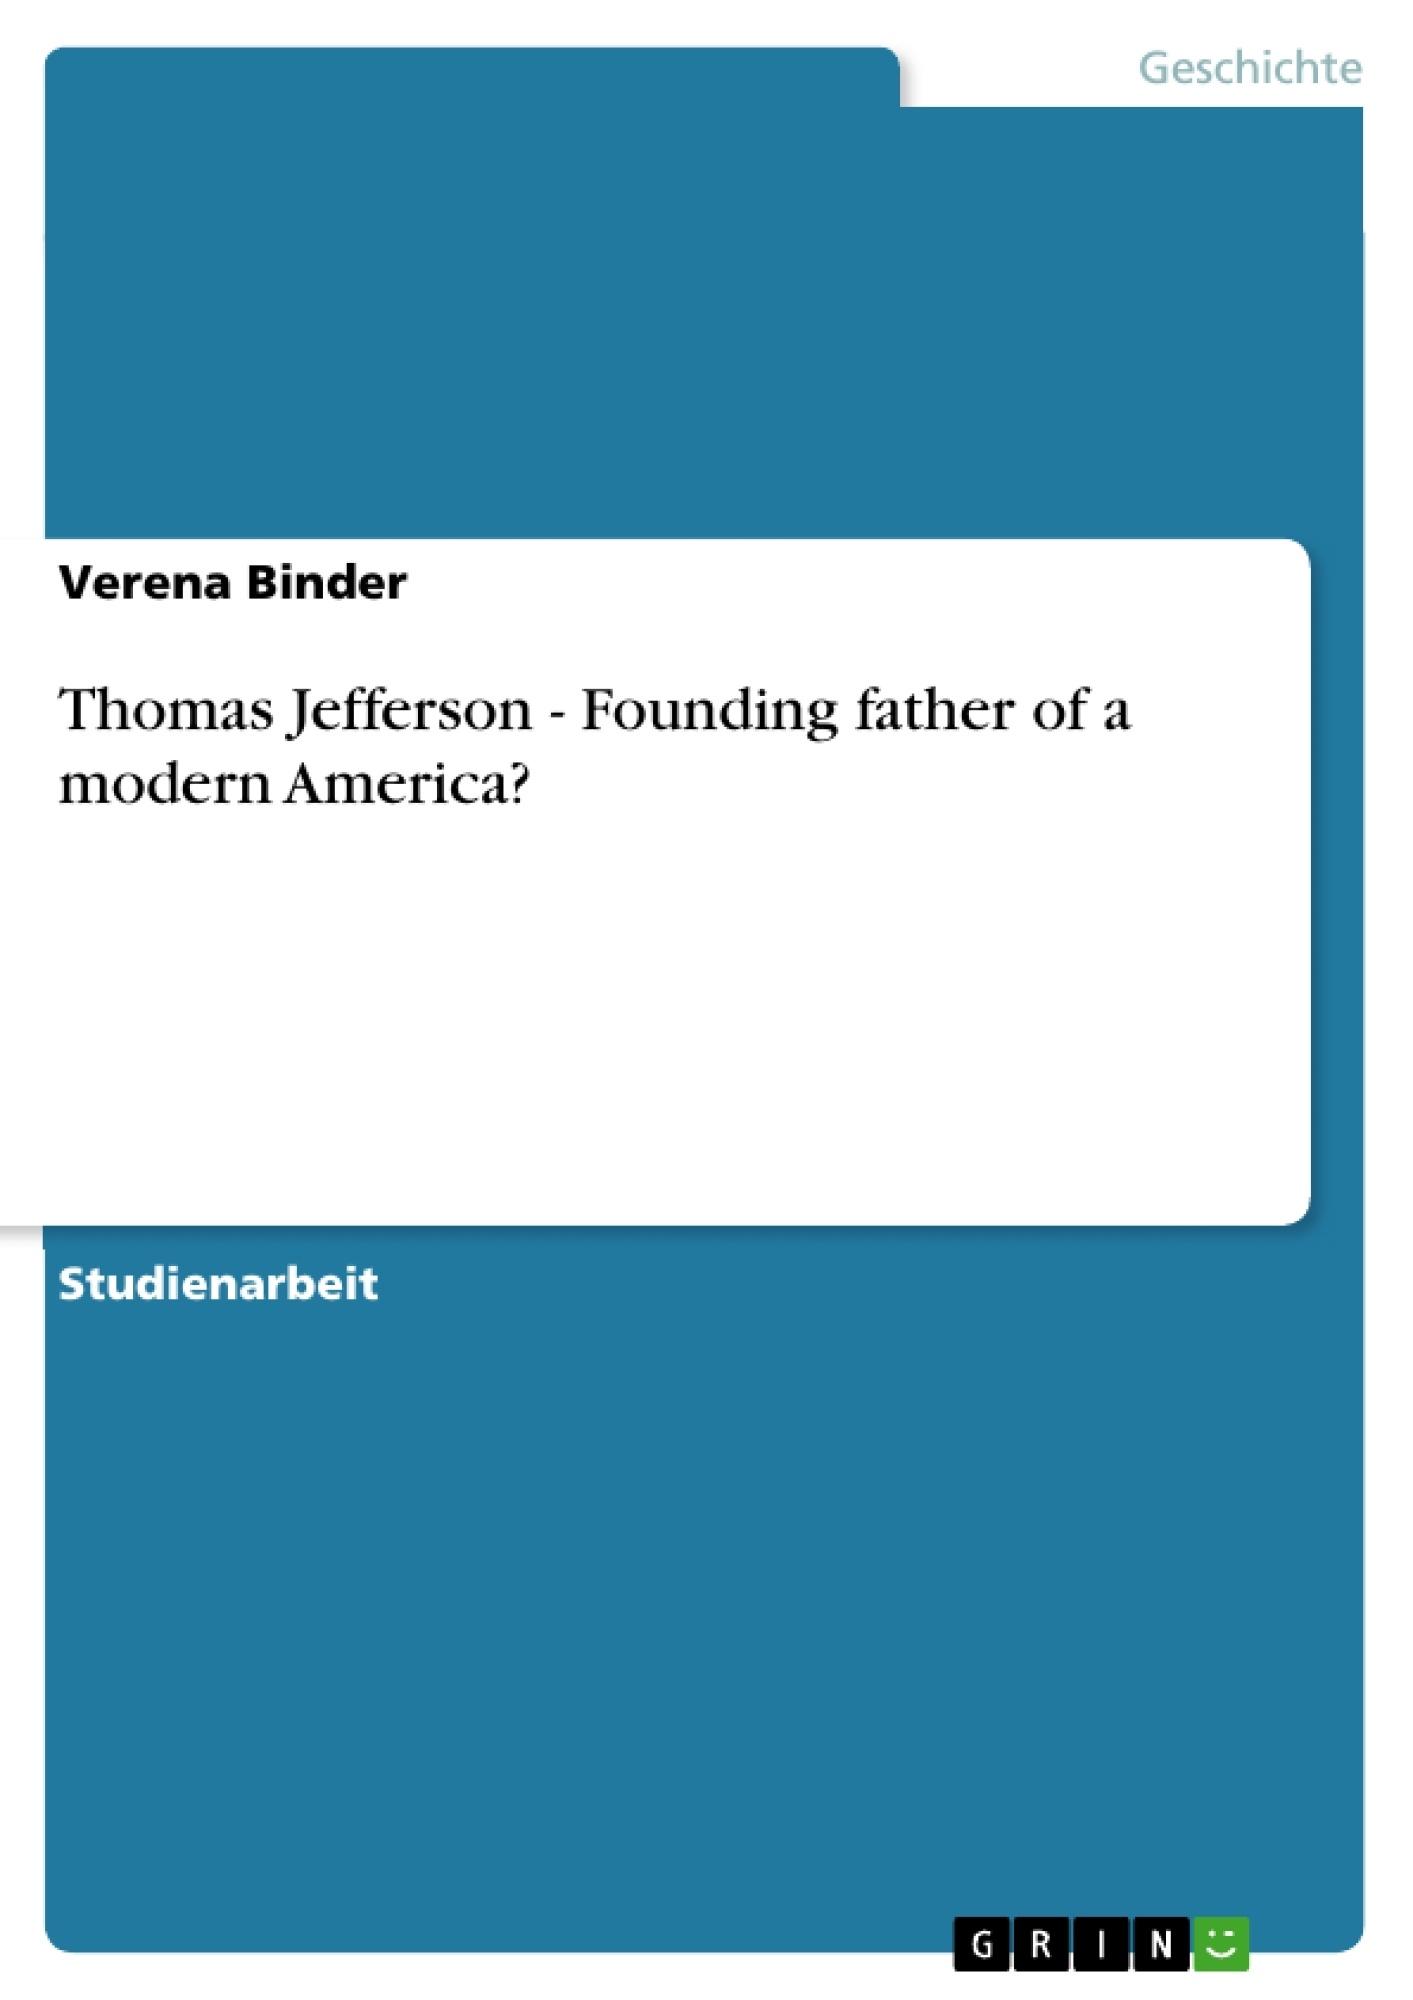 Titel: Thomas Jefferson - Founding father of a modern America?